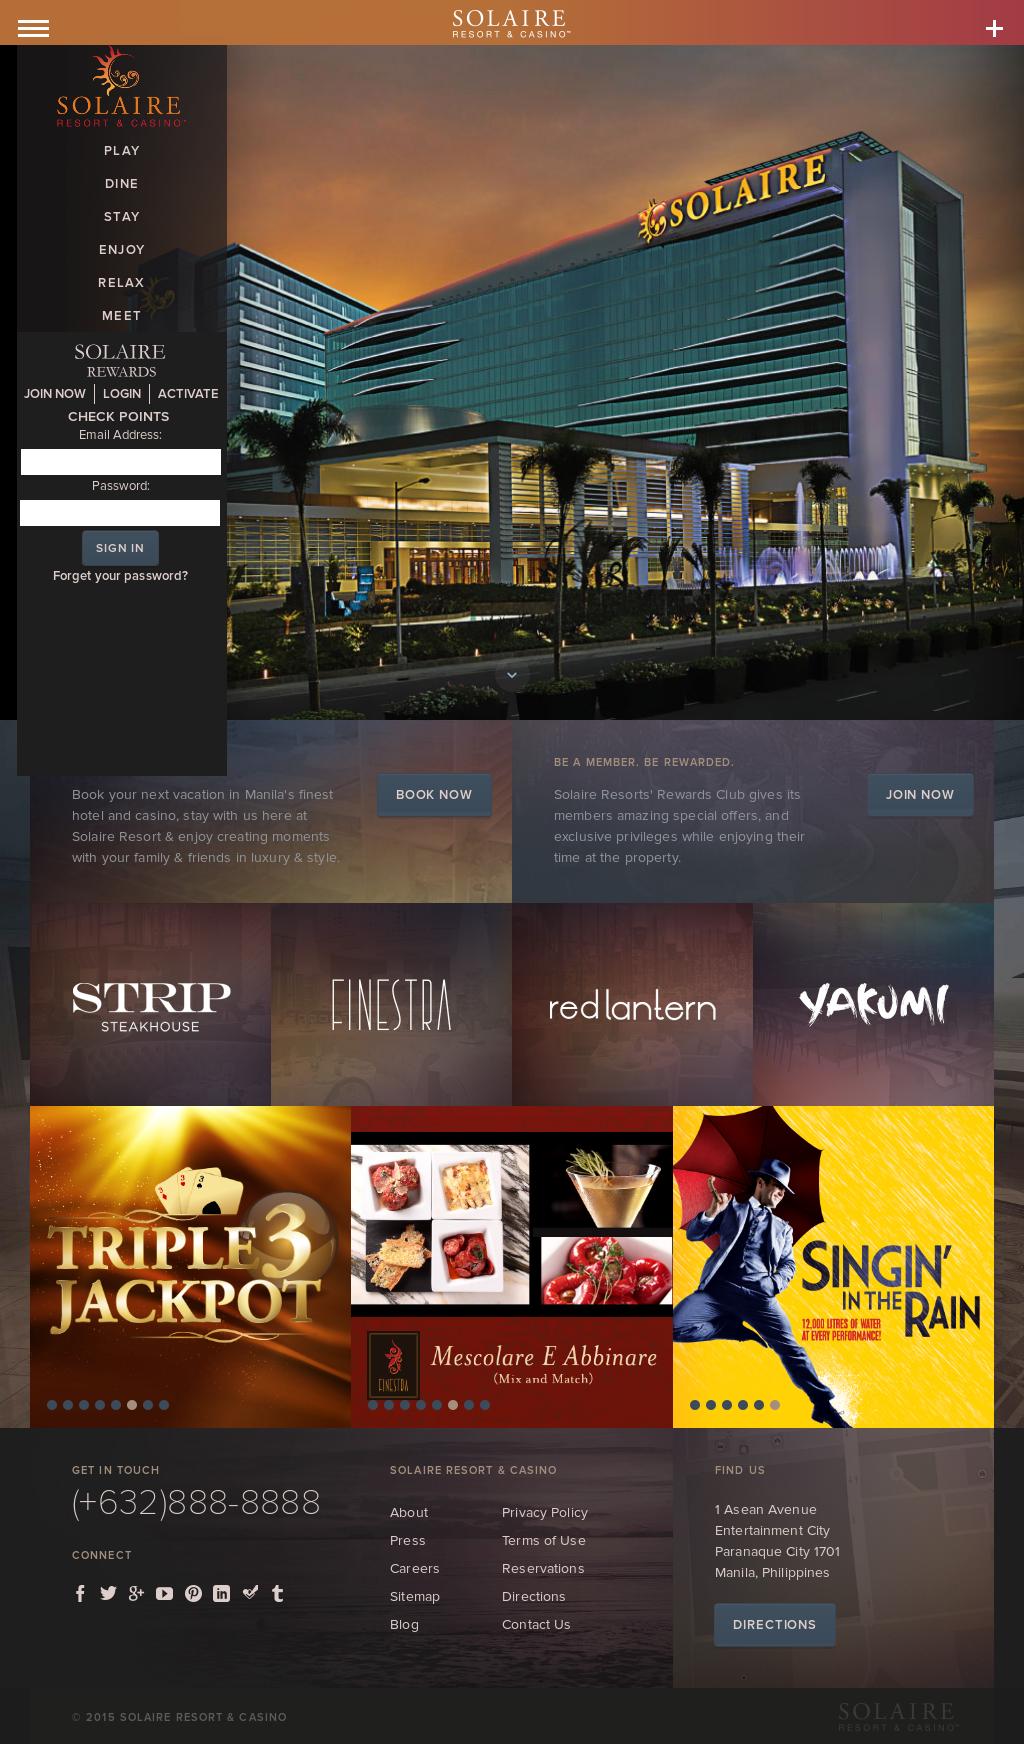 website for solaire casino